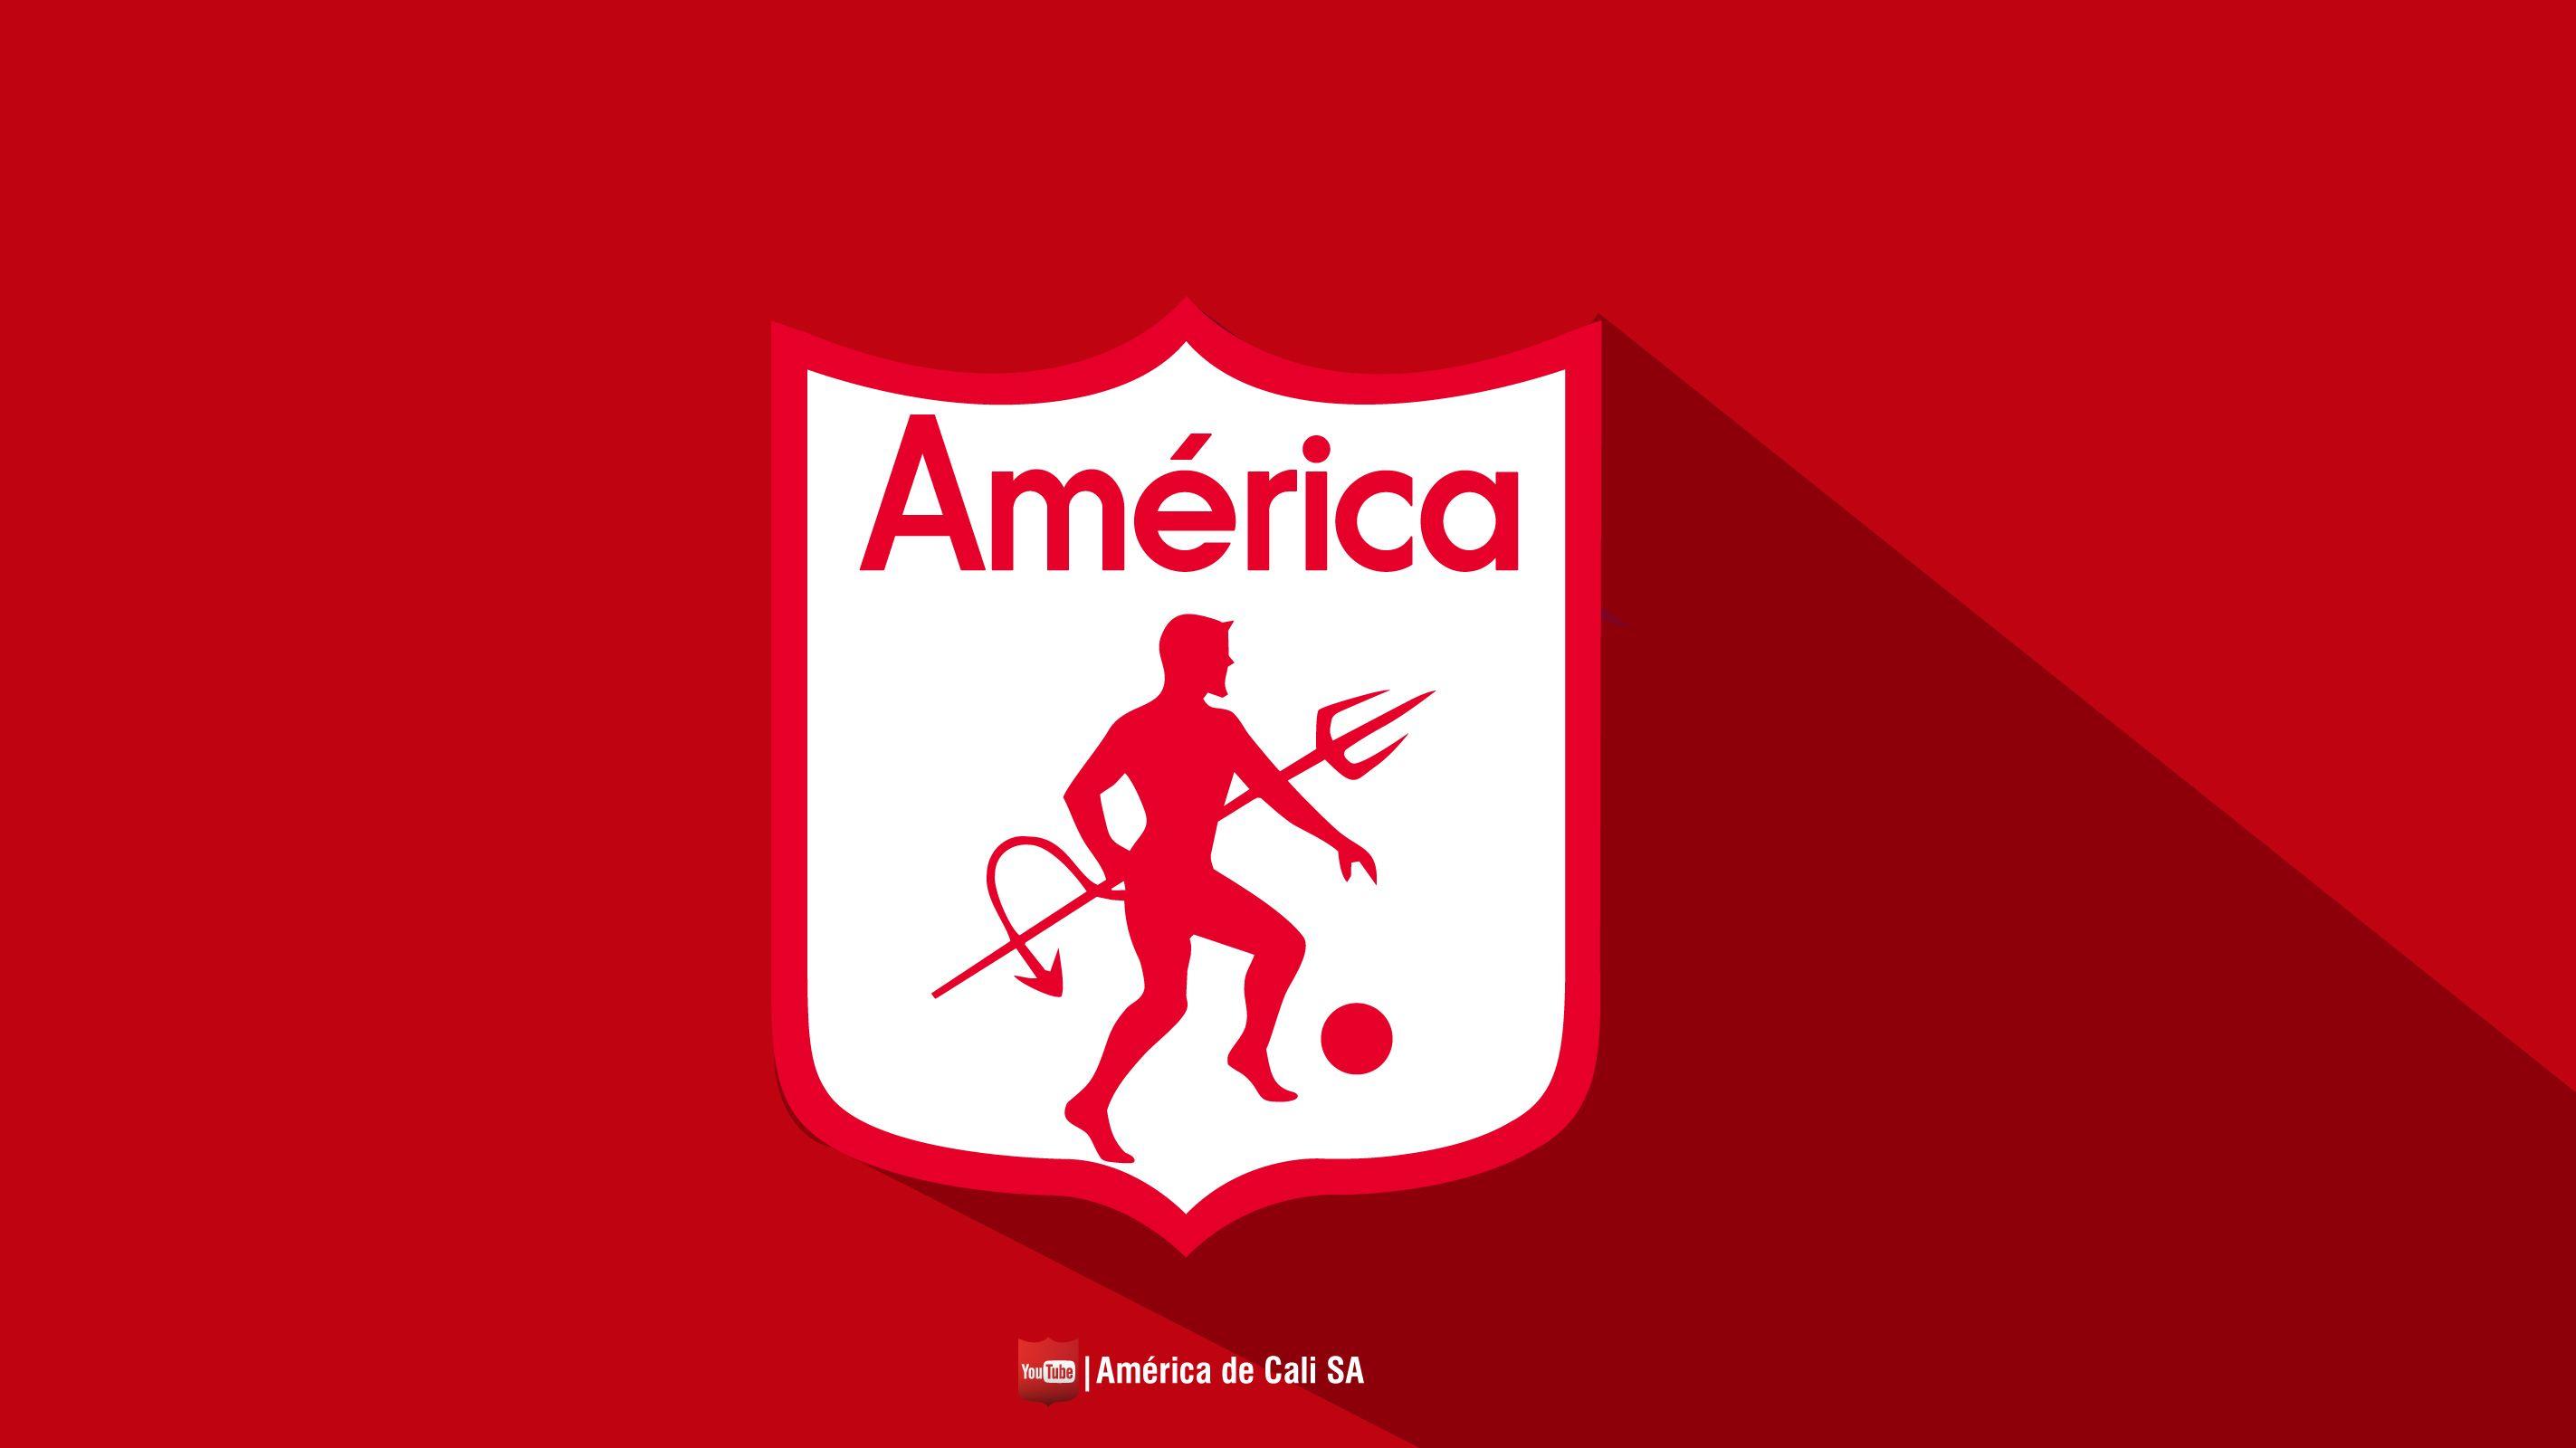 America De Cali Hd Wallpaper Download America De Cali Hd With